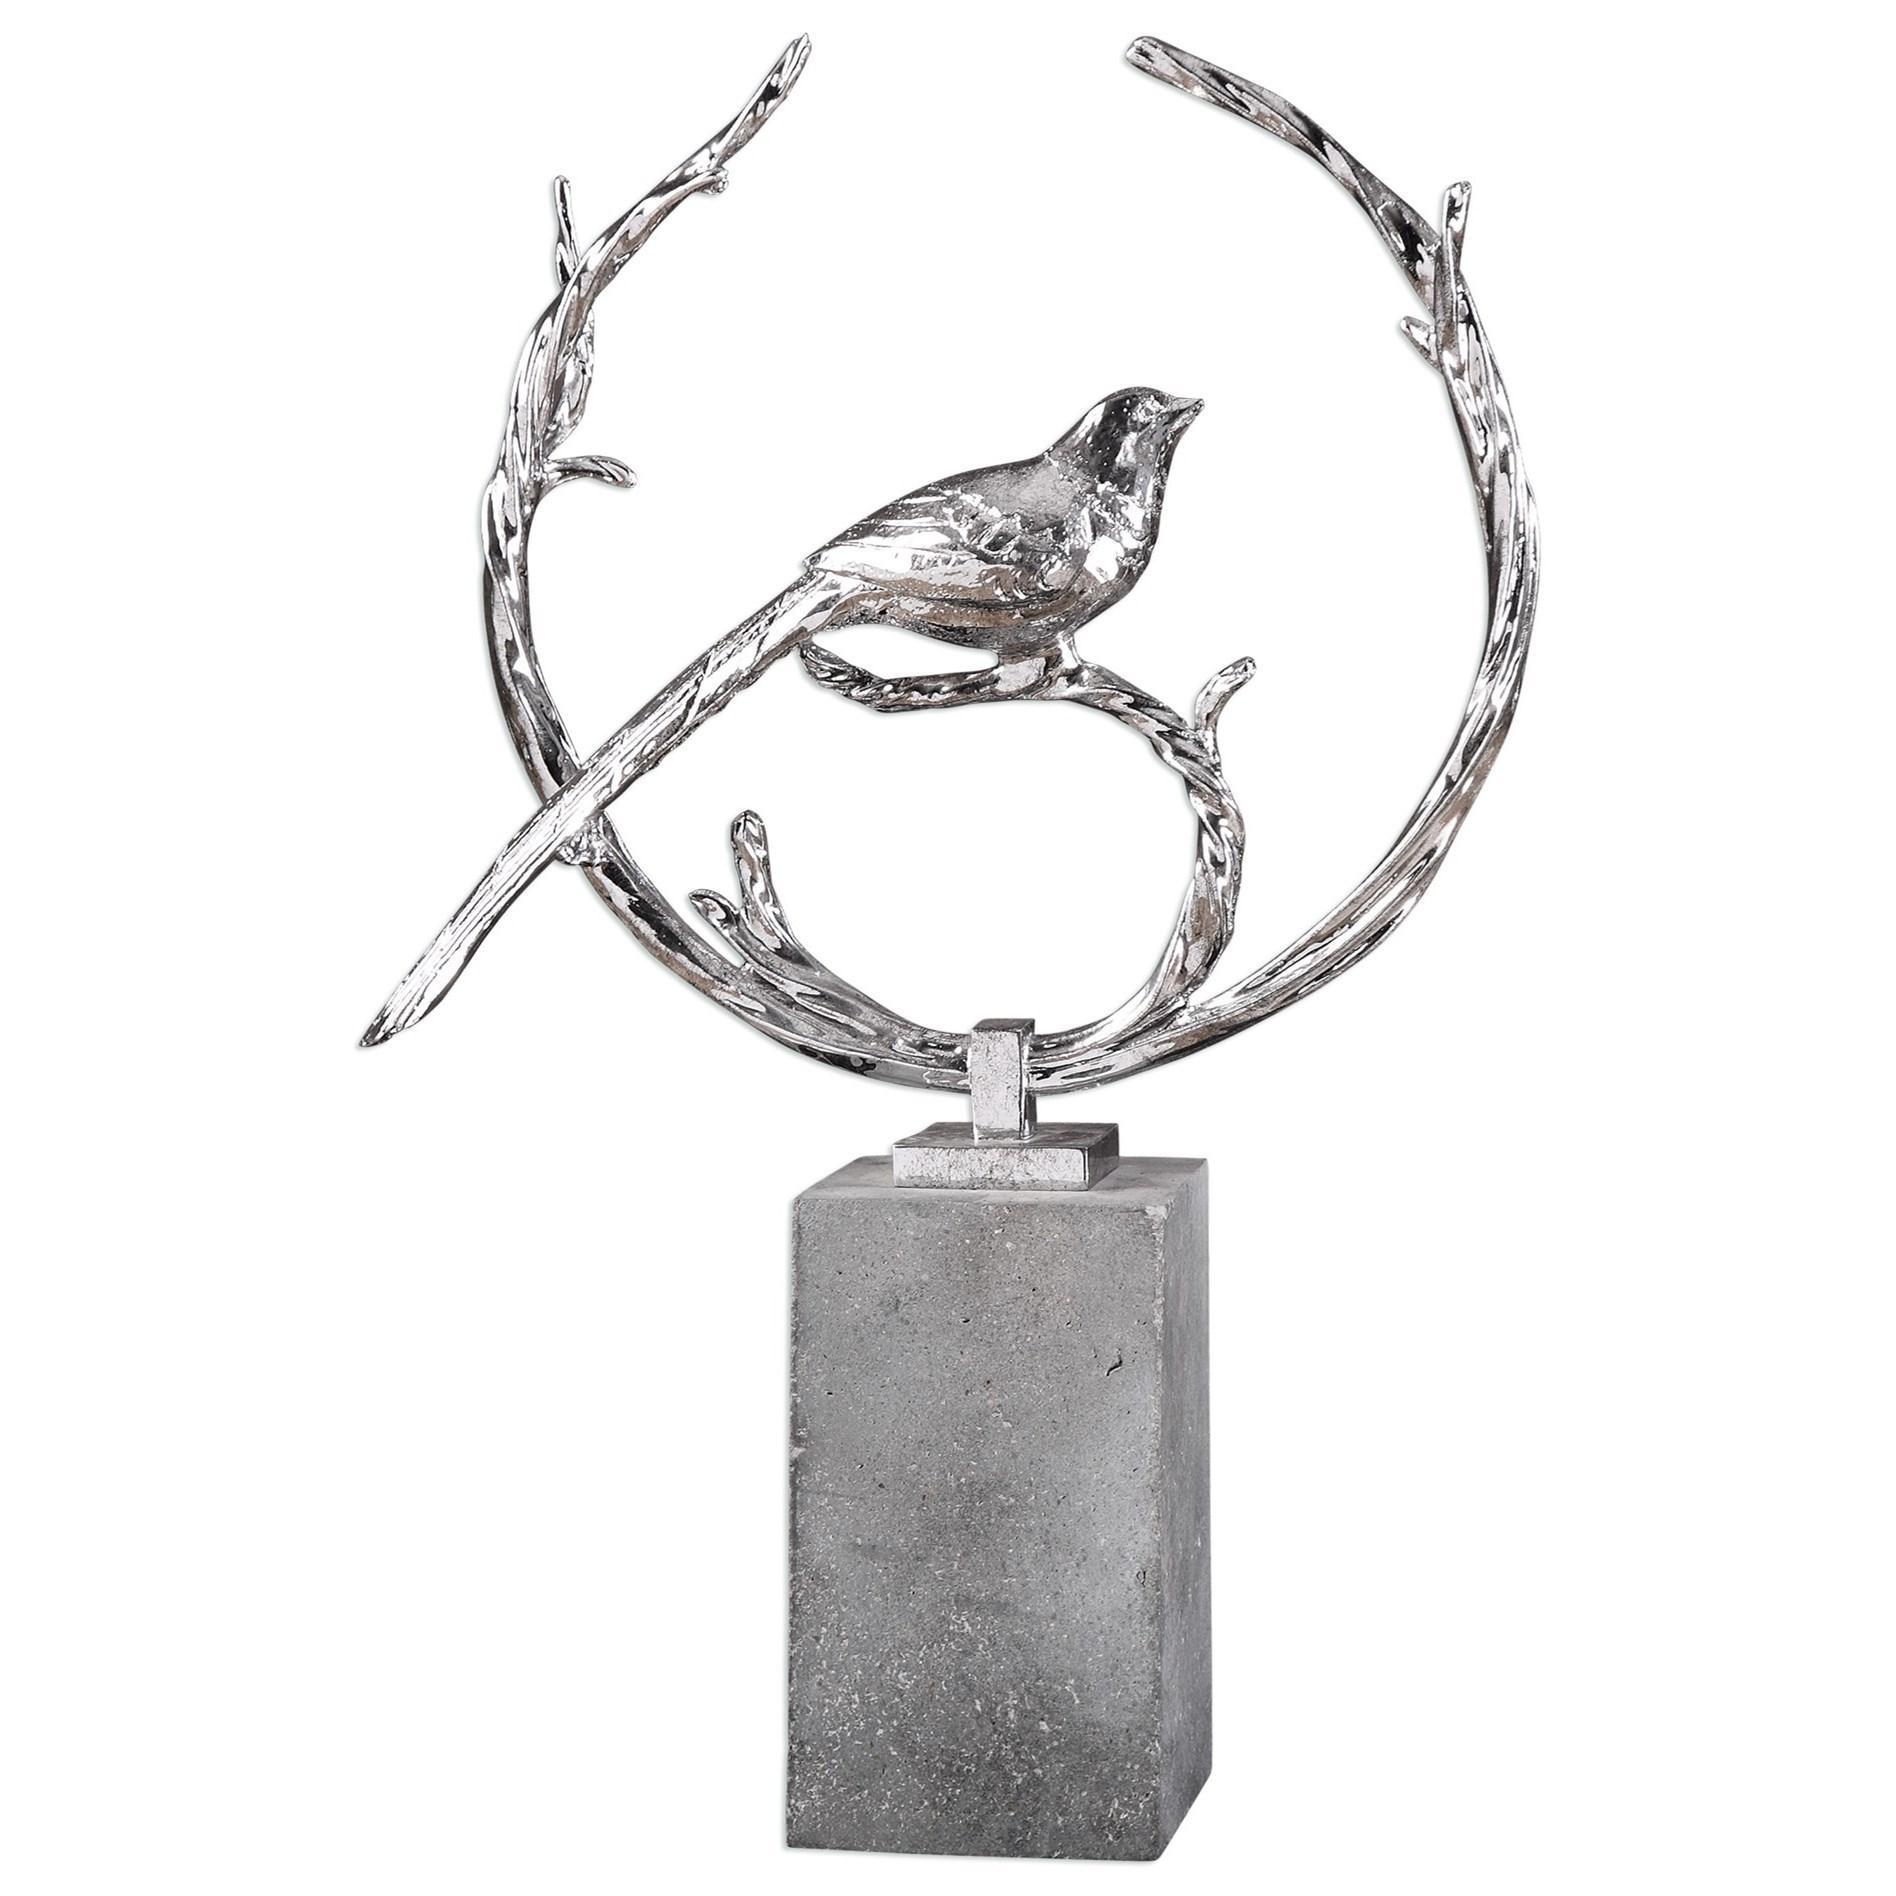 Uttermost Accessories Rosana Sculpture - Item Number: 20143